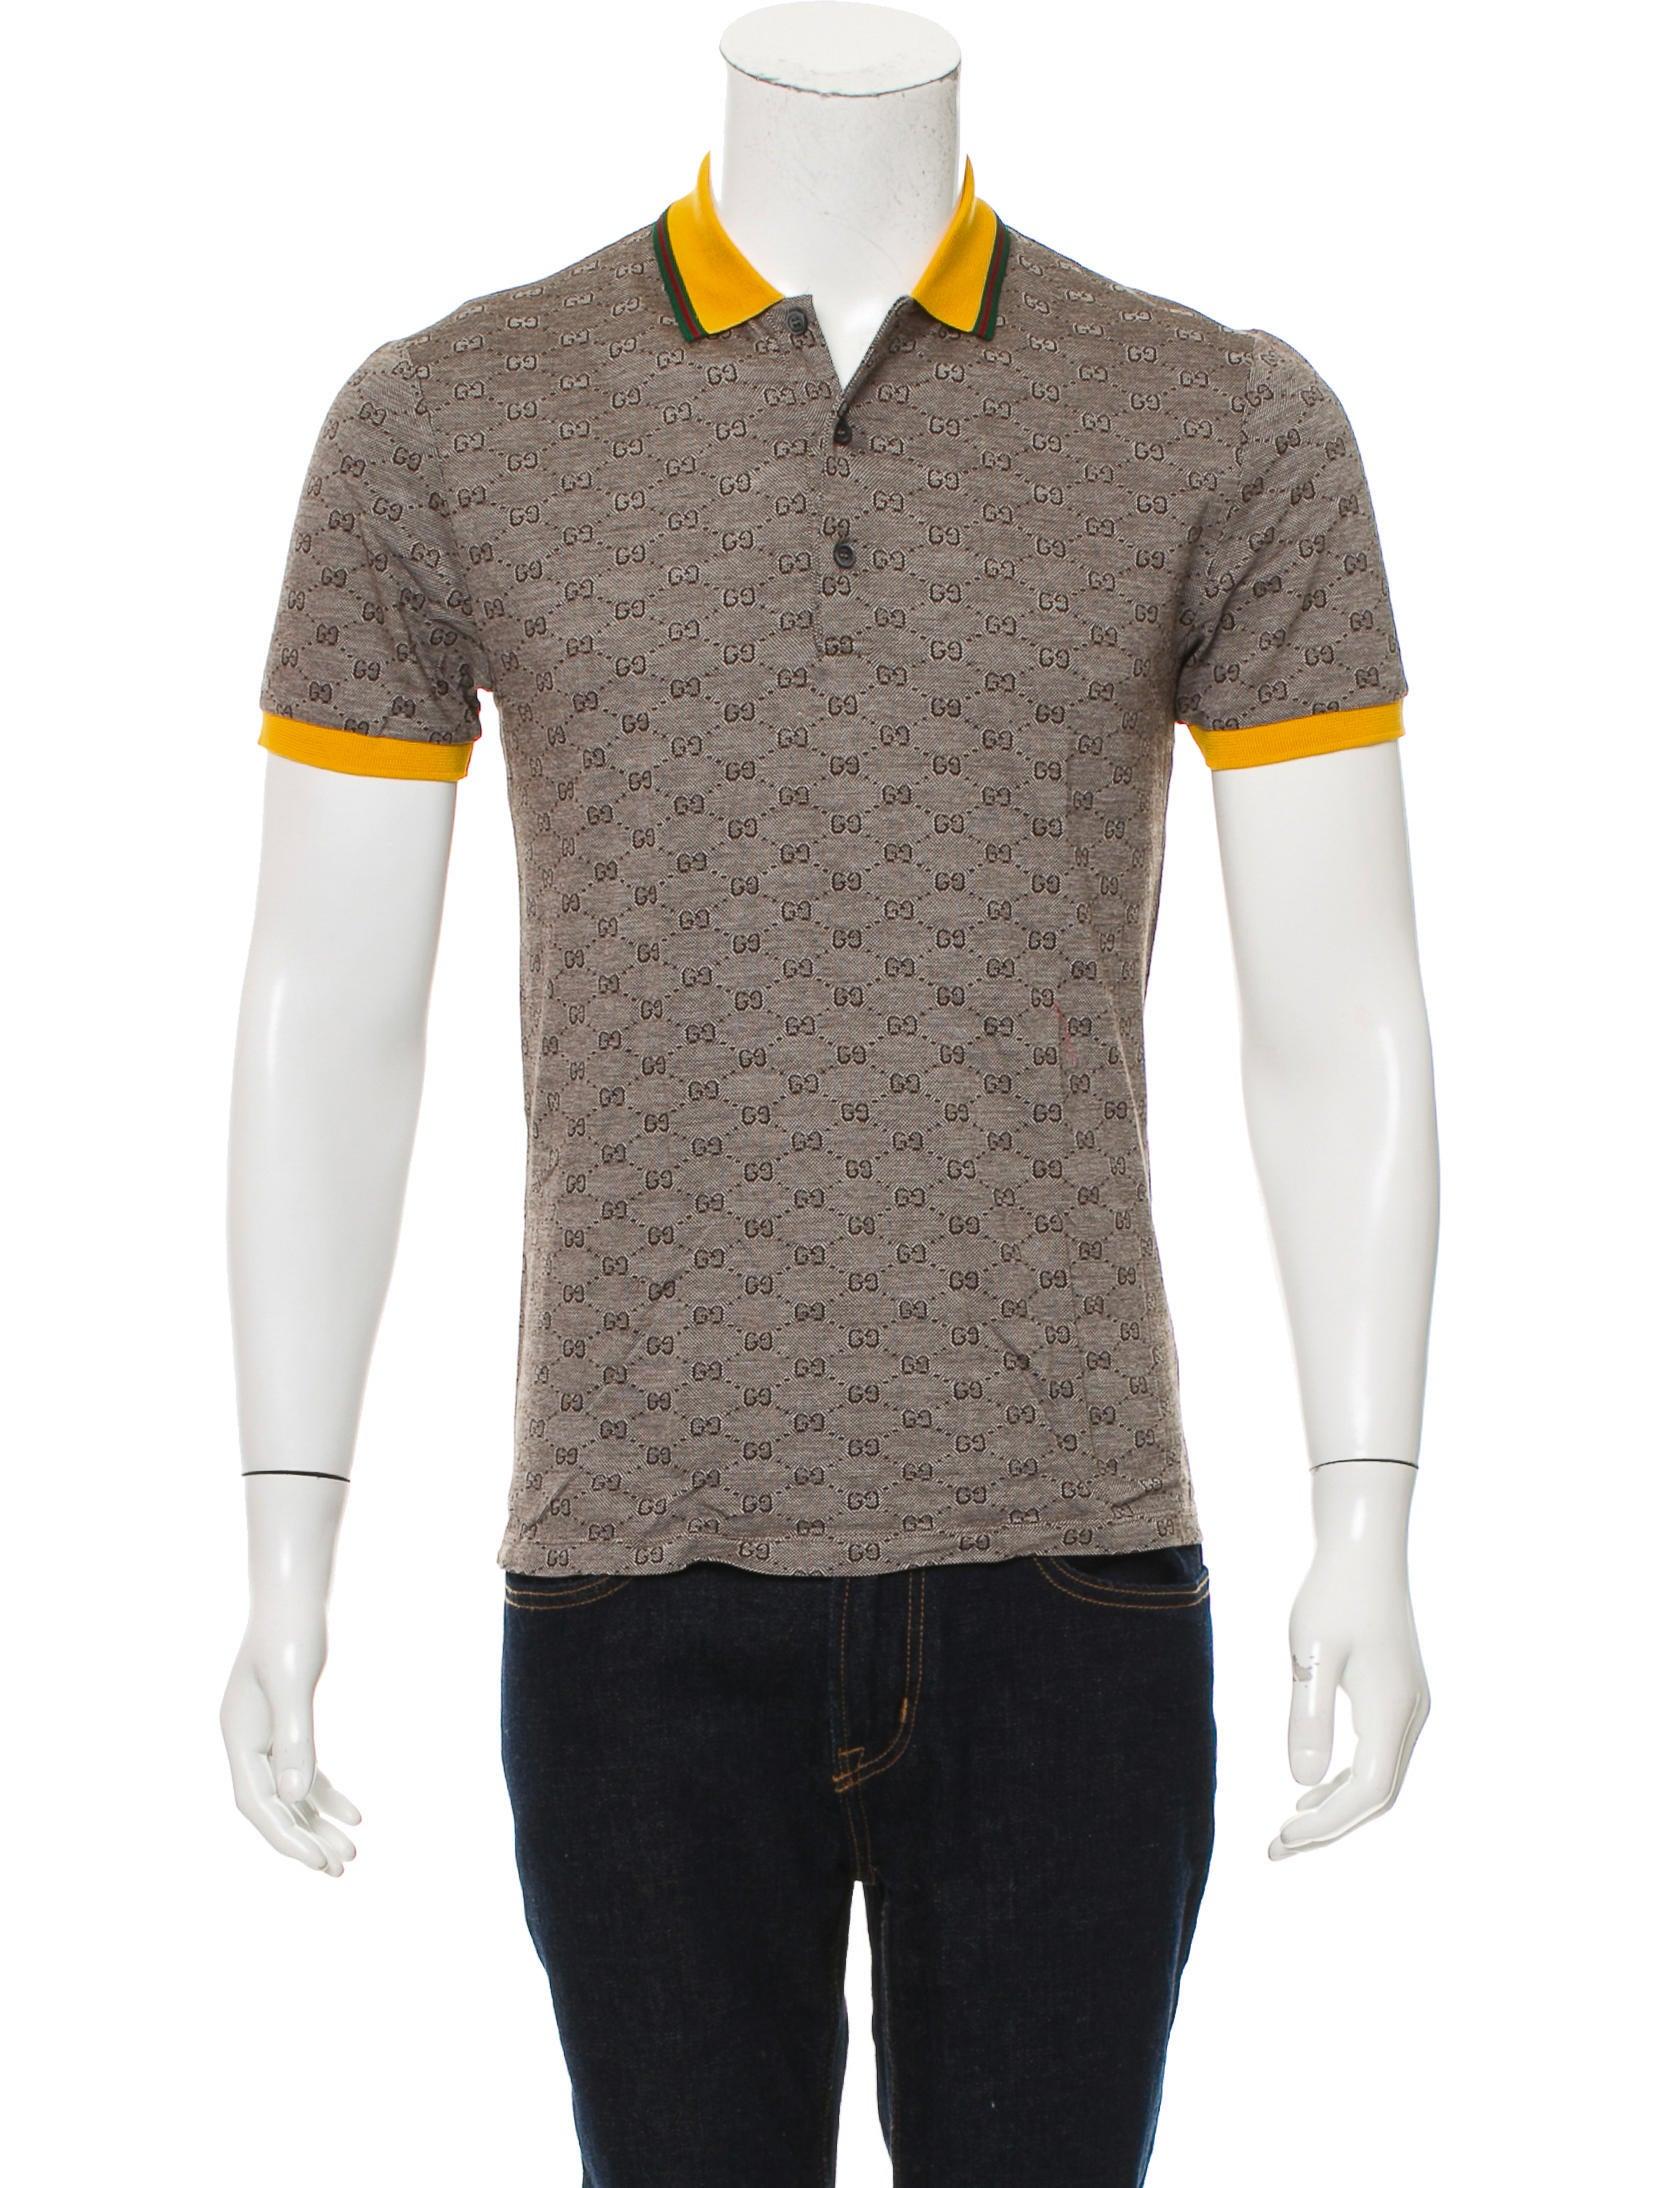 ecf7765b0c6 Gucci GG Supreme Polo Shirt w  Tags - Clothing - GUC188403